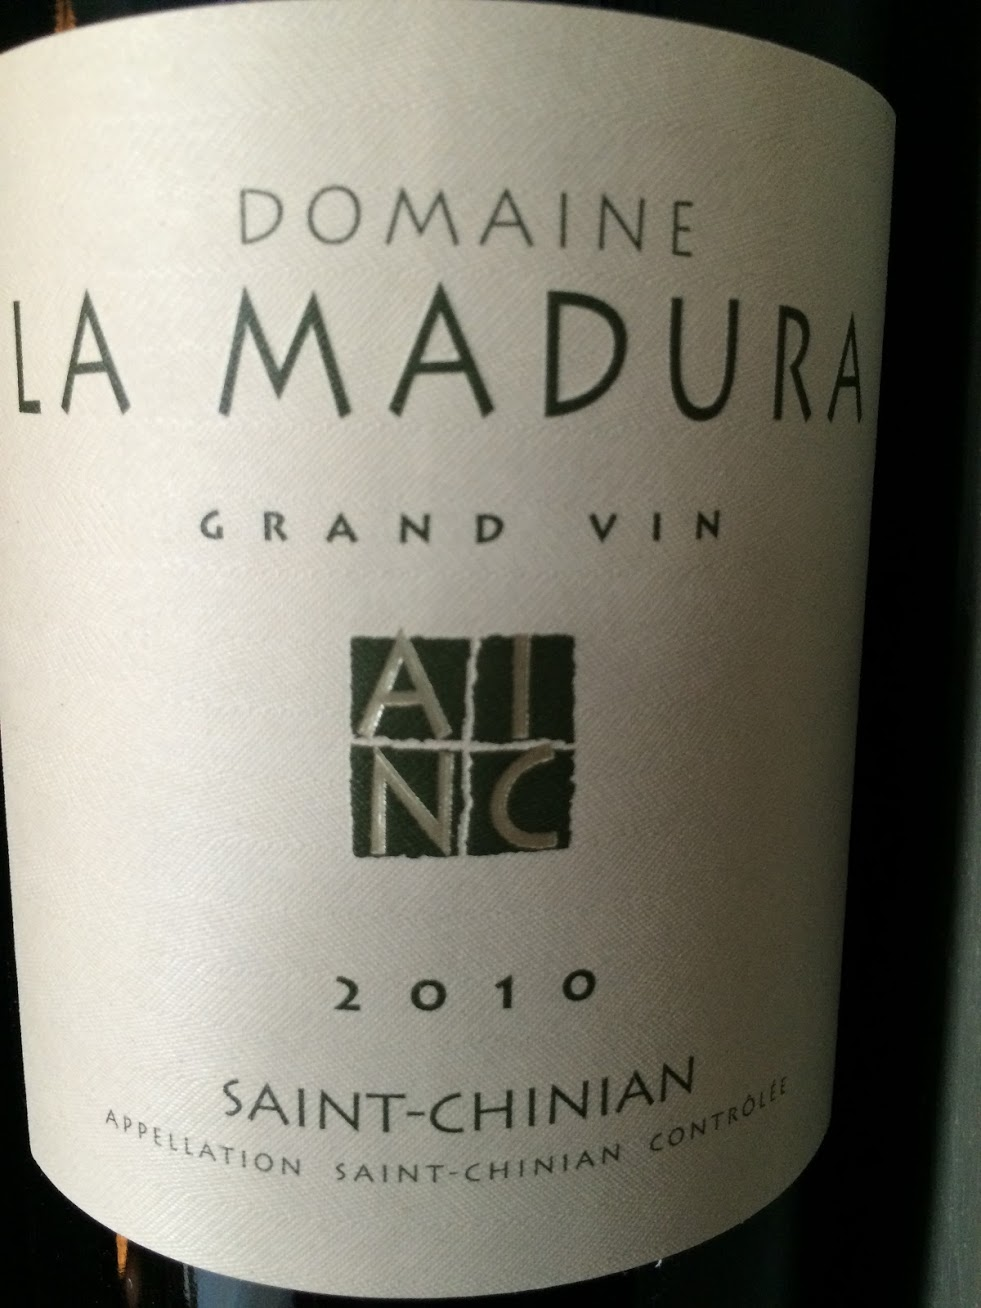 La Madura - Grand Vin - Rouge - 2010